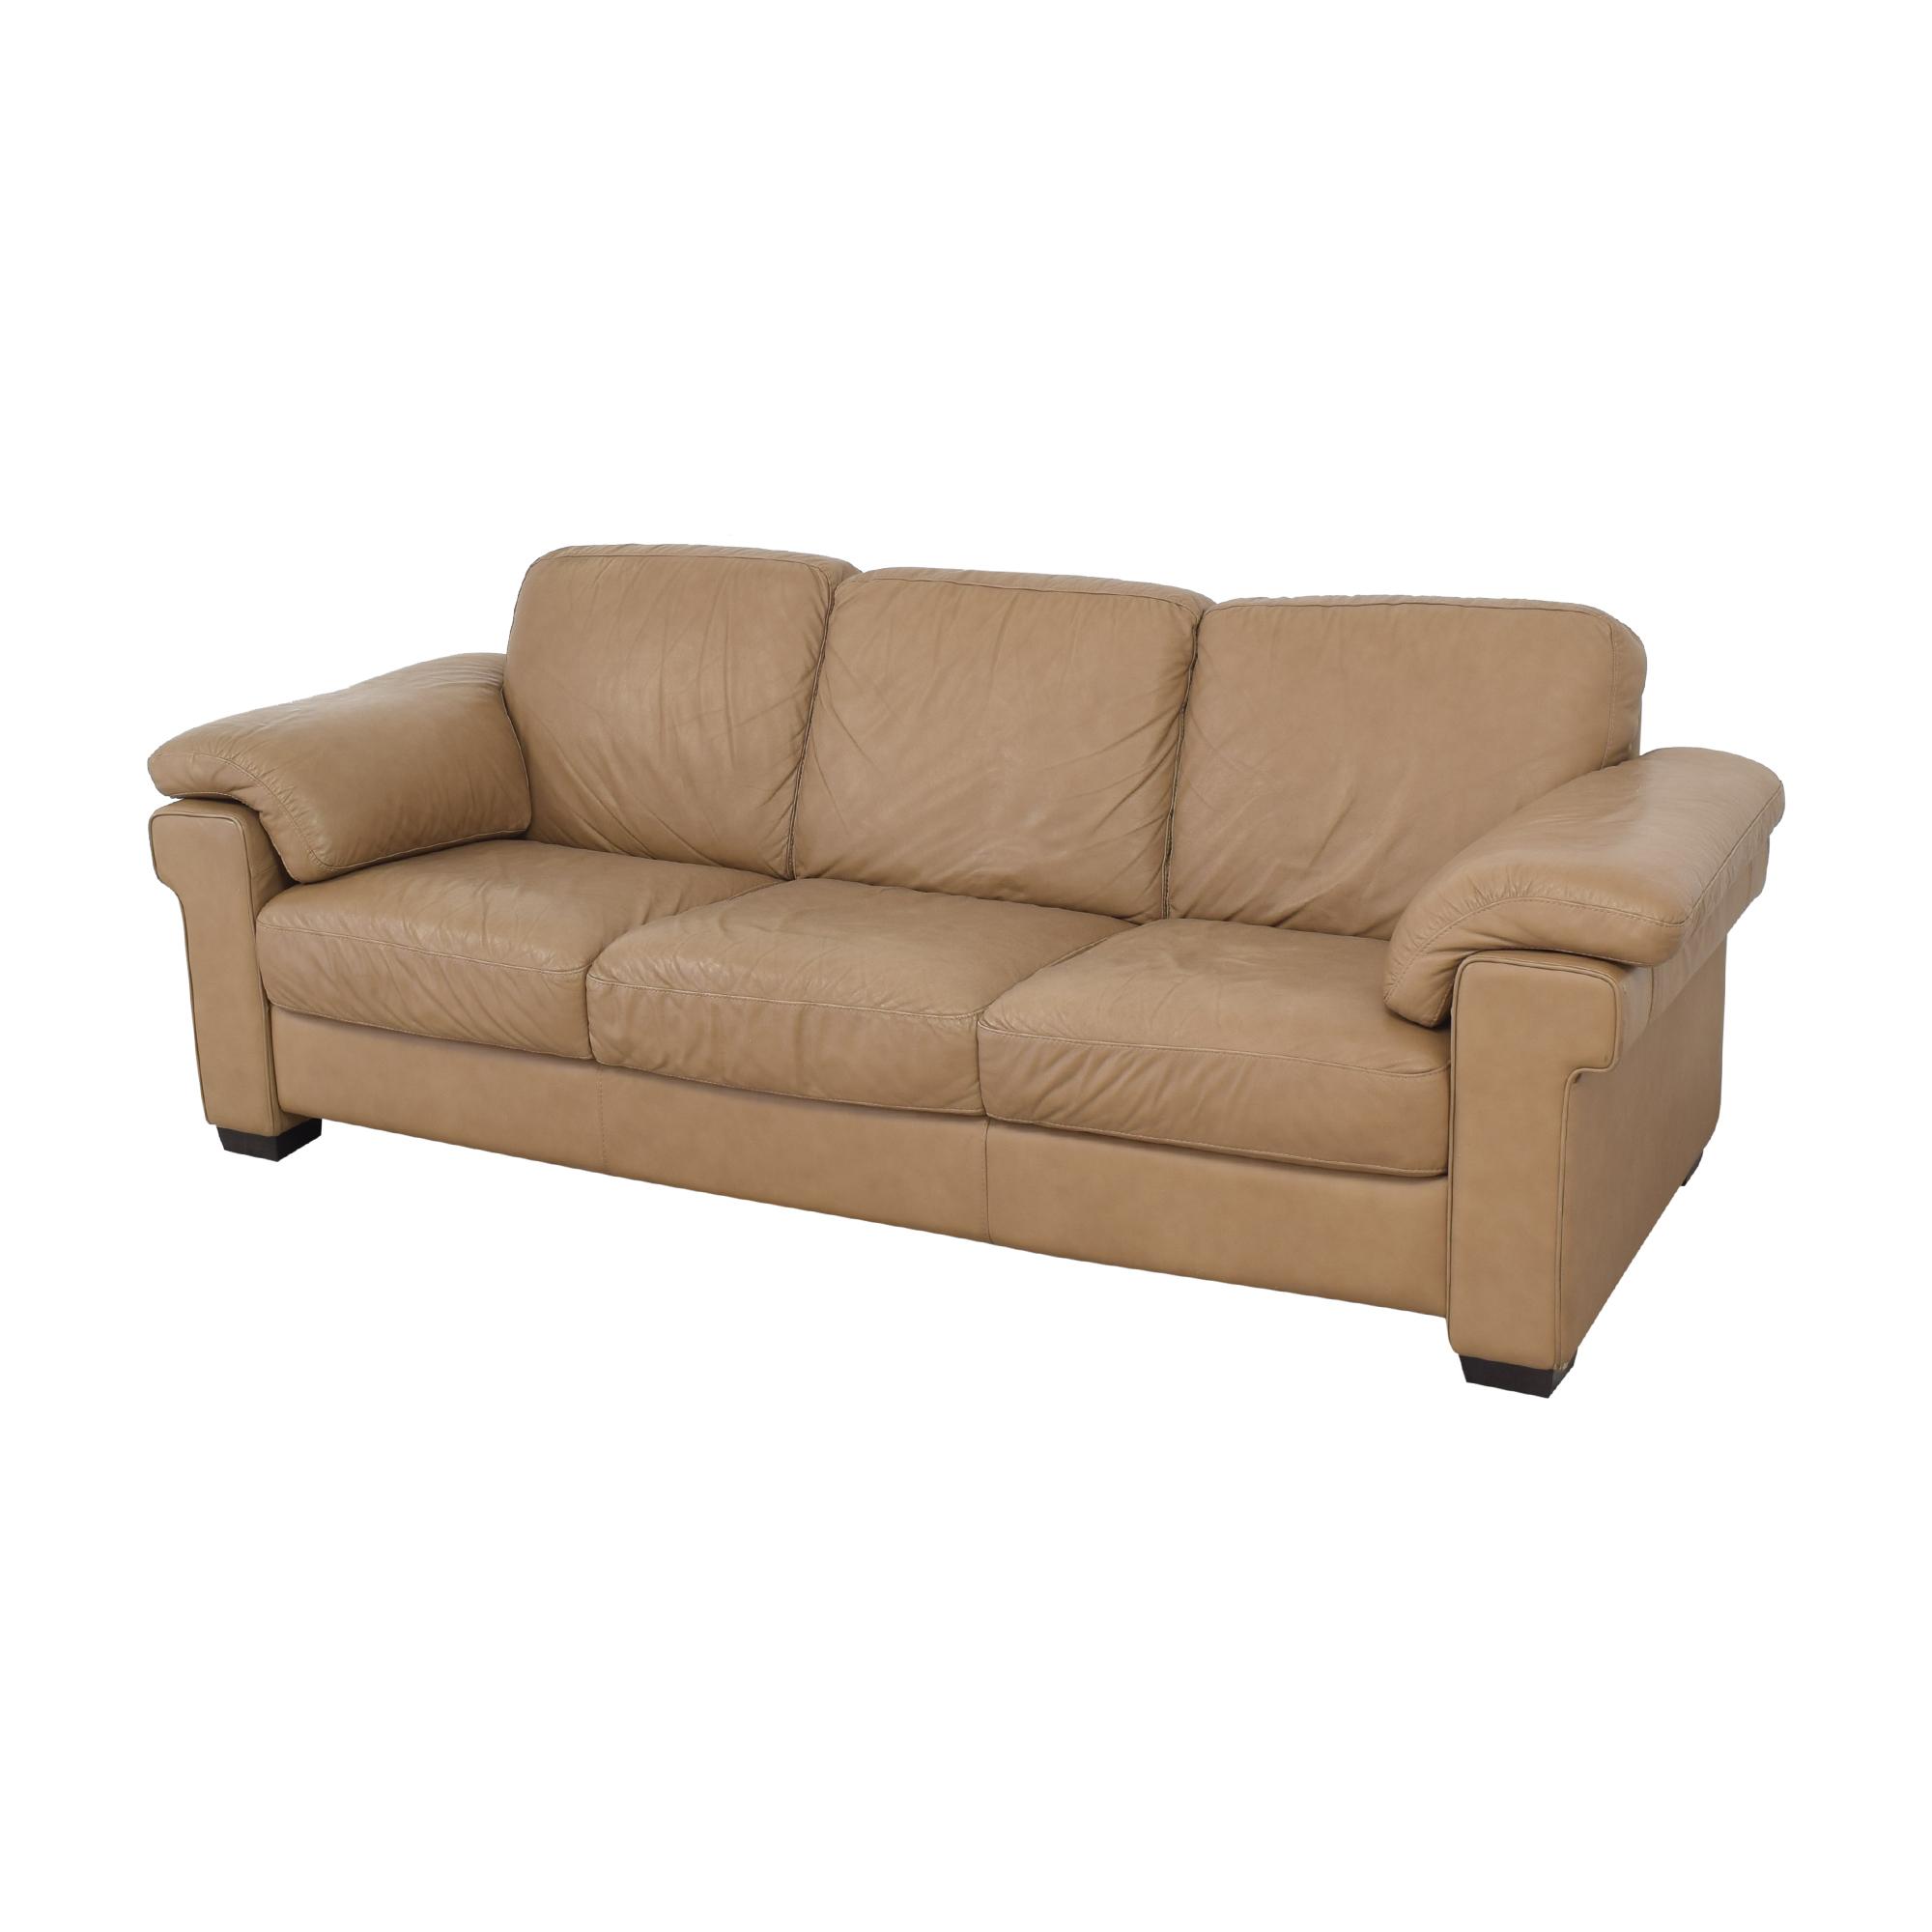 buy Natuzzi Three Seat Sofa Natuzzi